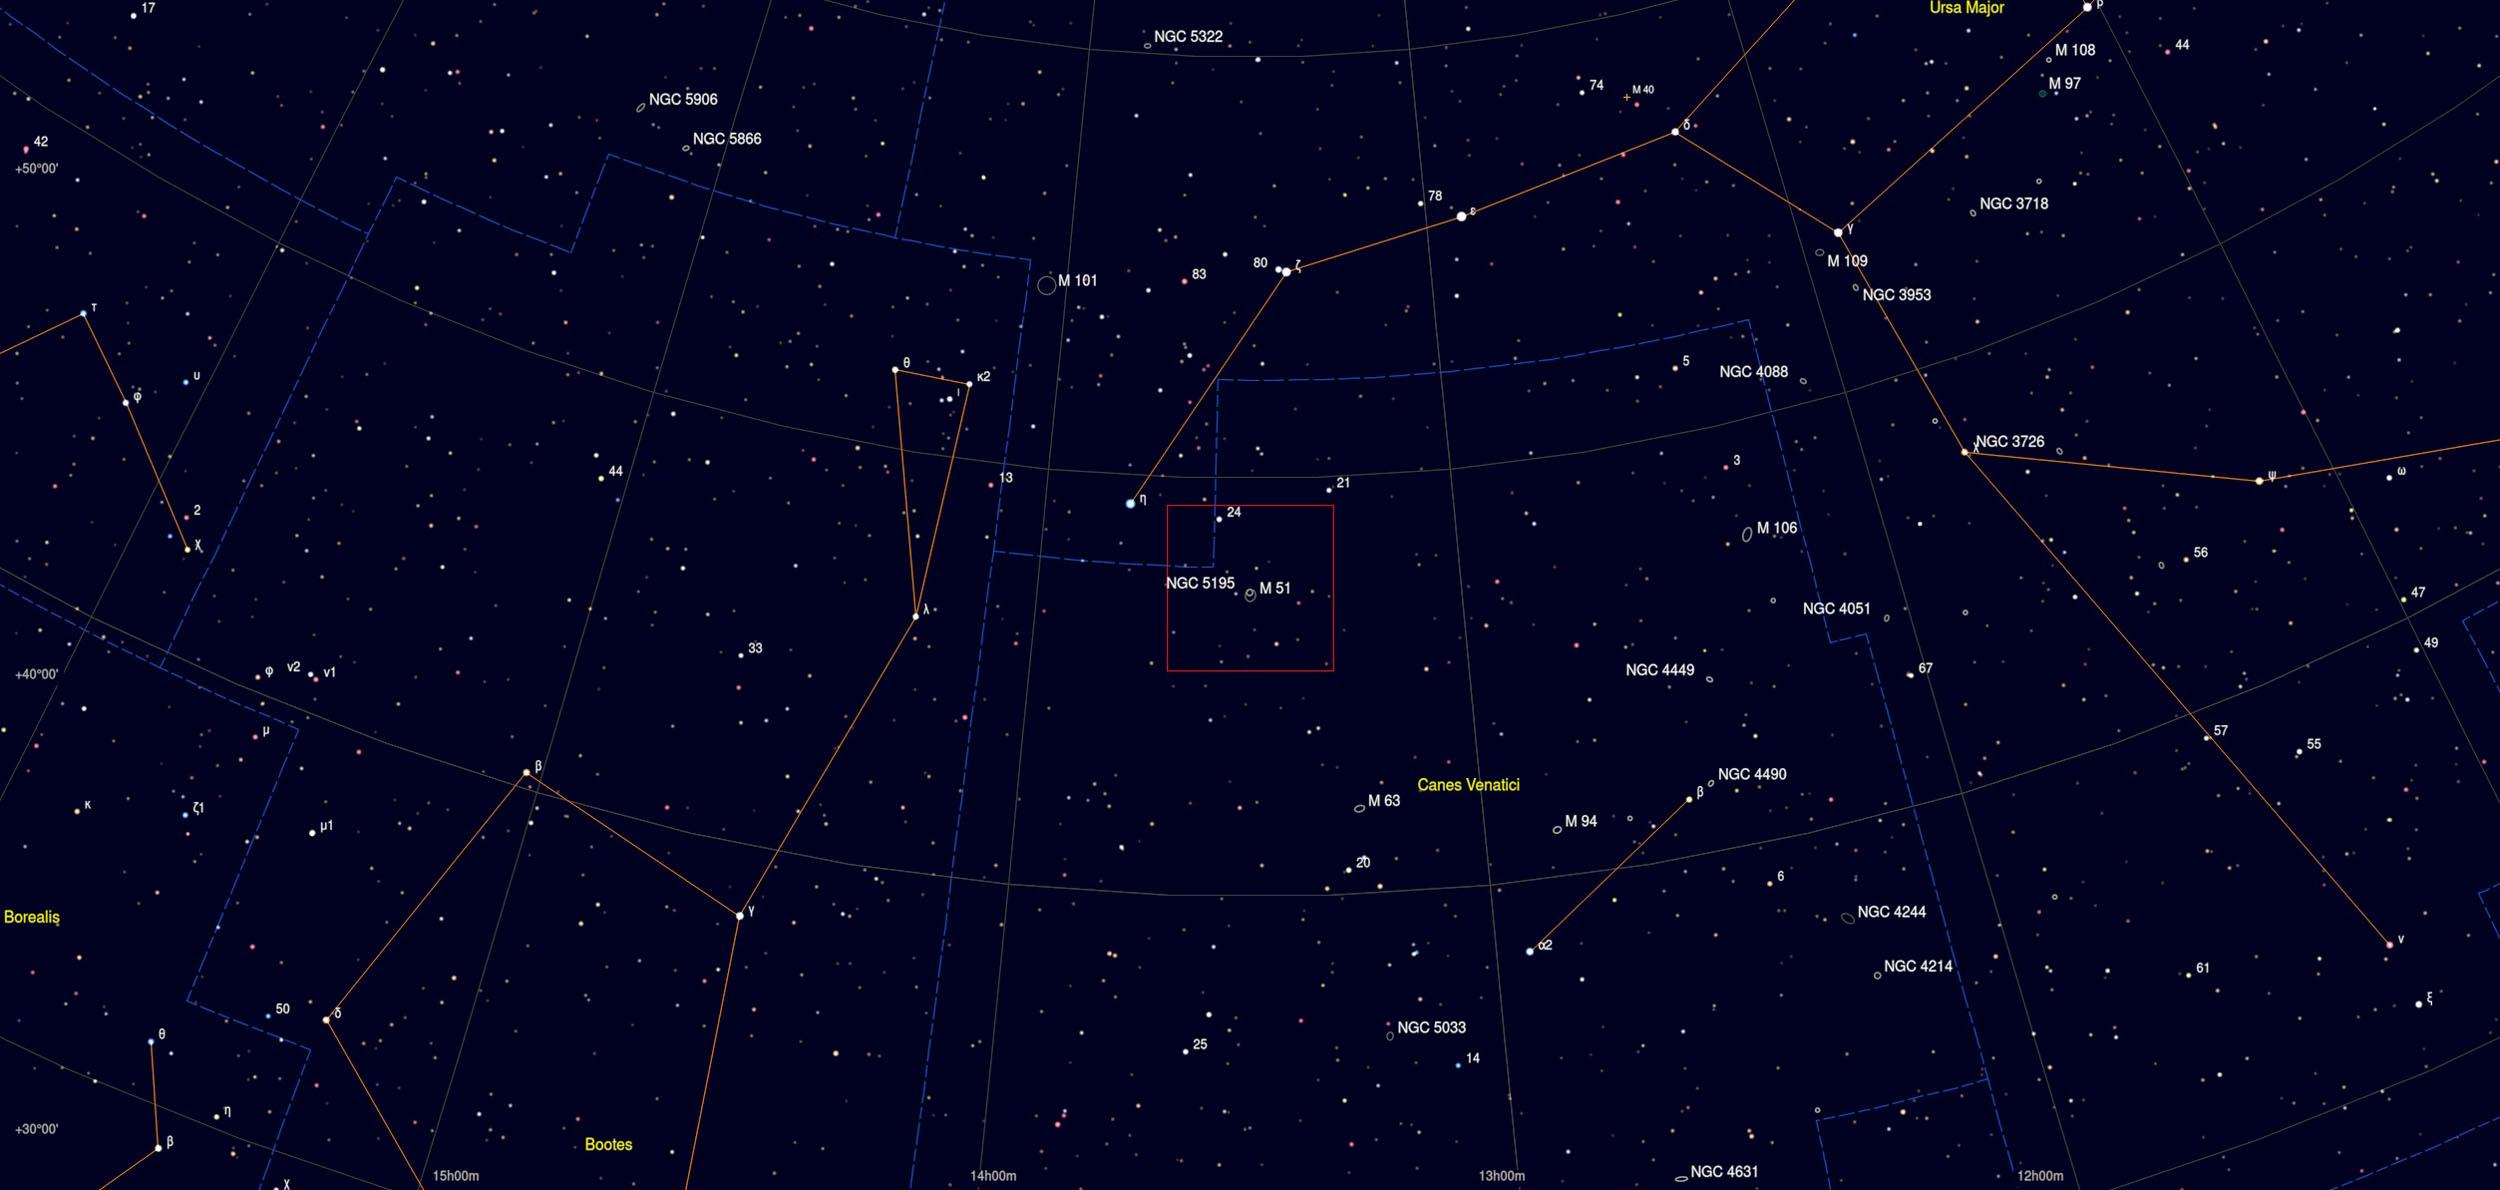 M51 Galaxy Astrophotography Martin Rusterholz Skychart